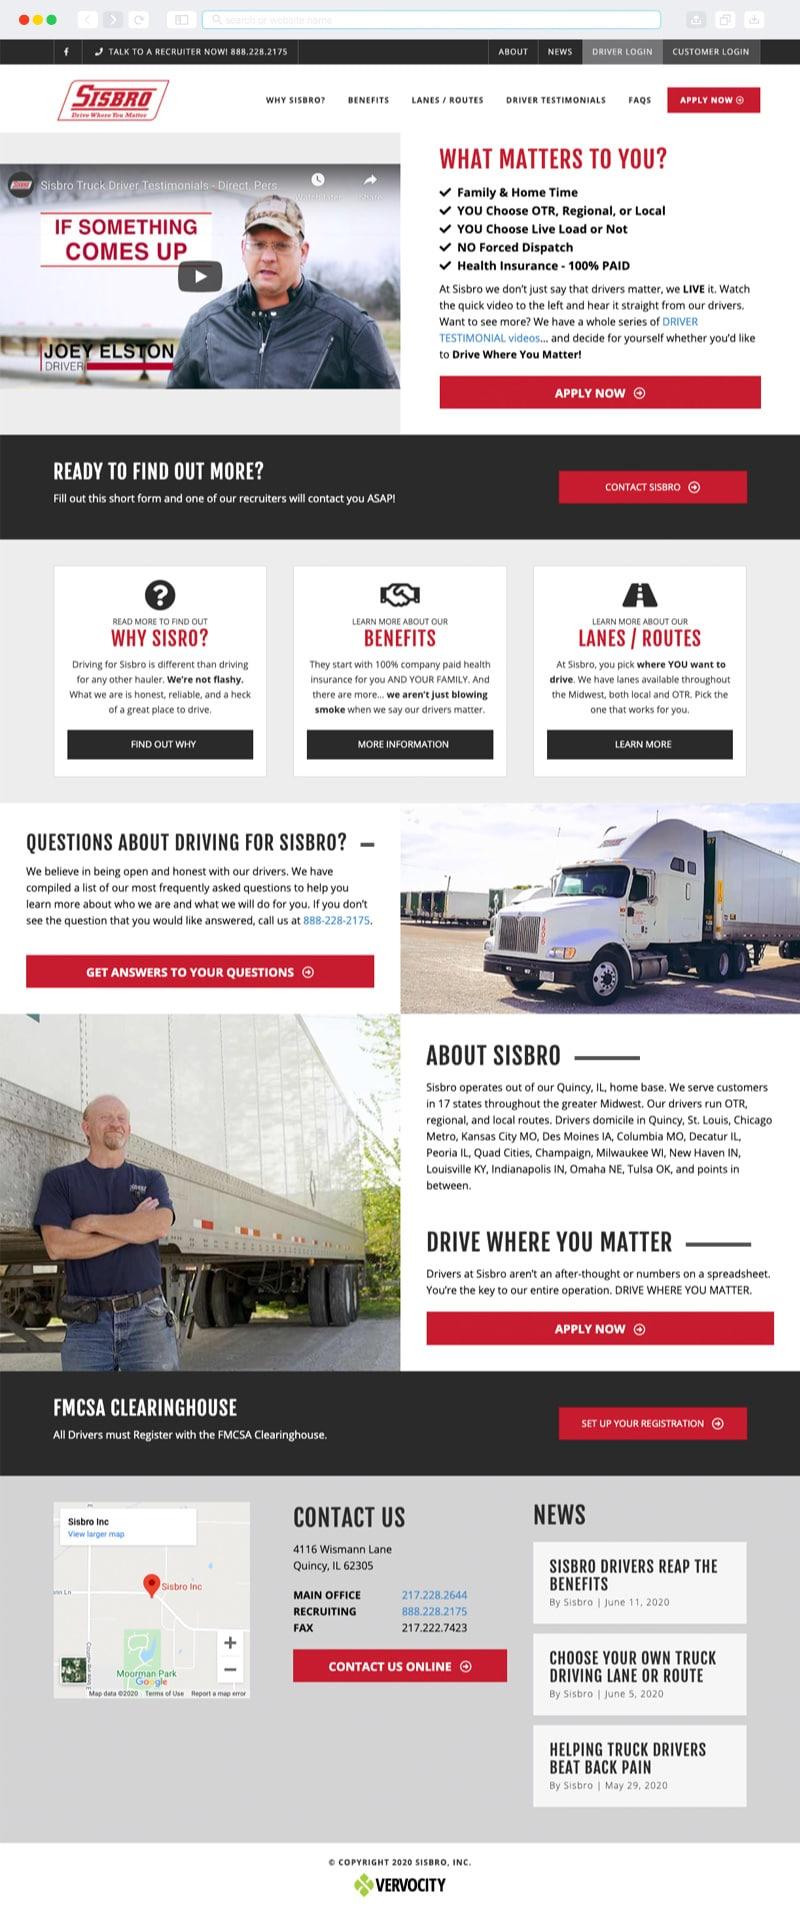 Sisbro Homepage | Vervocity